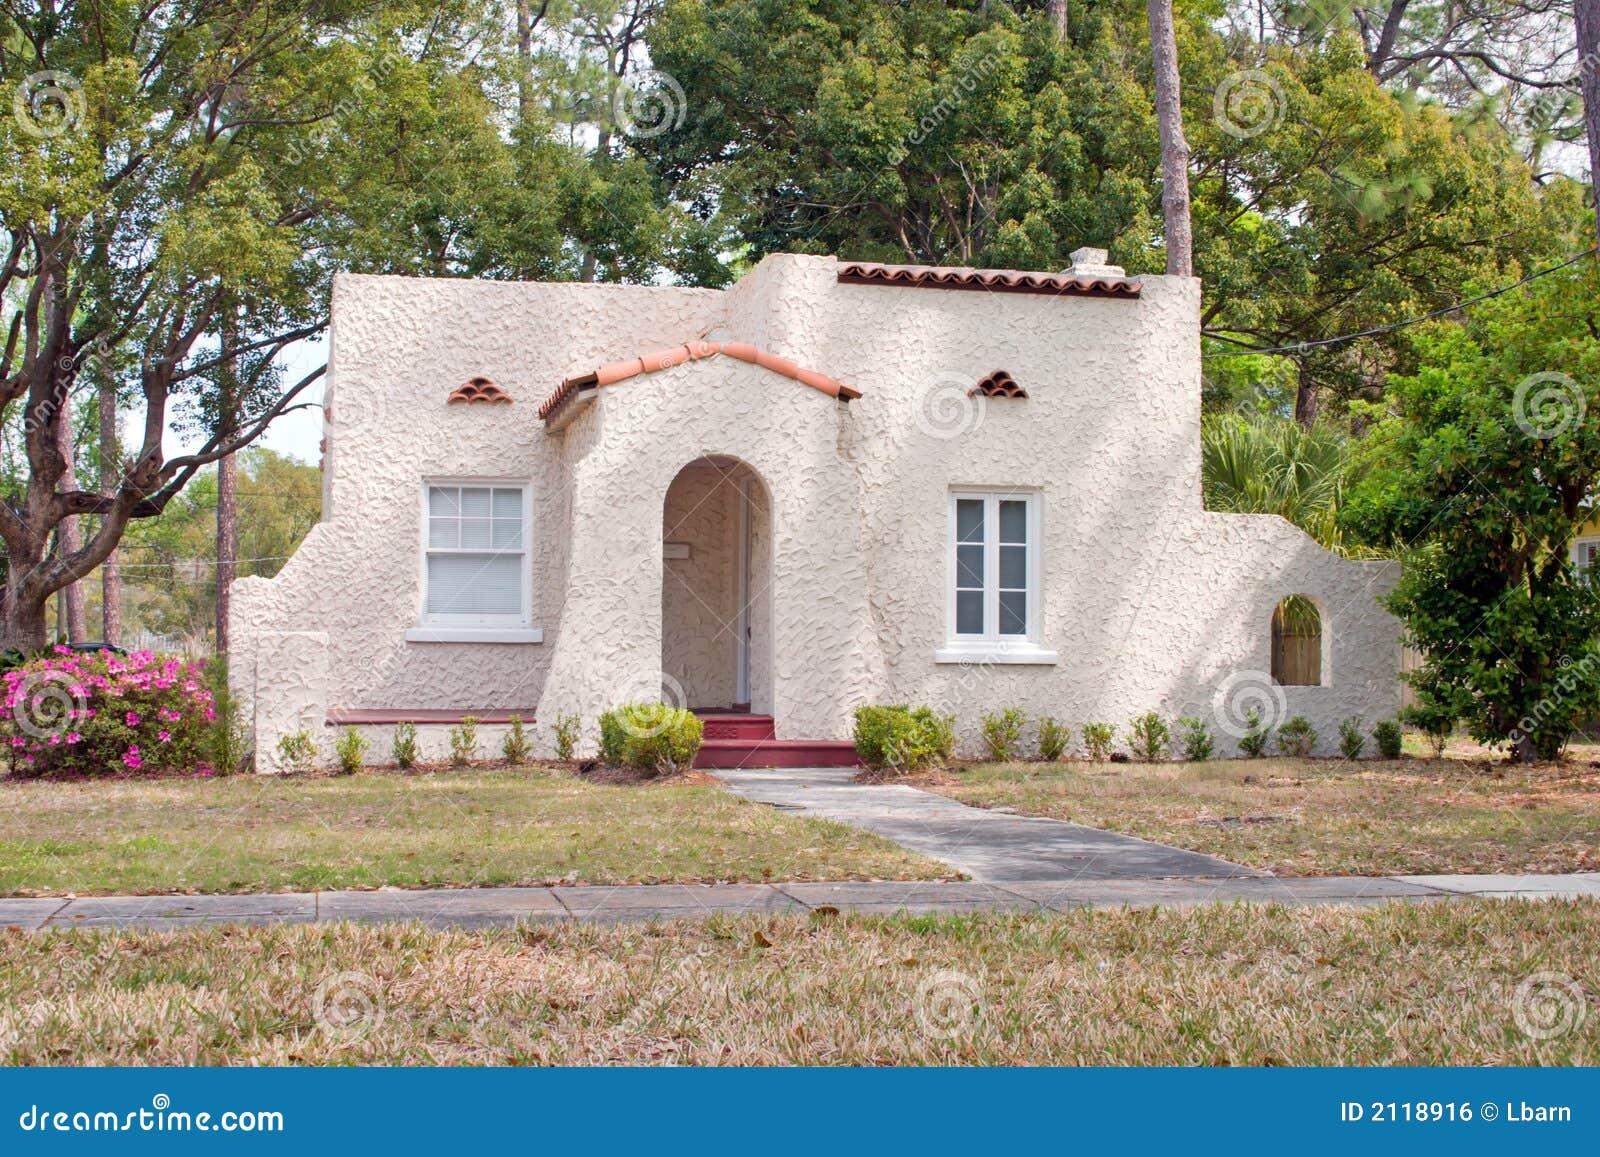 Spanish Style Florida Home Royalty Free Stock Image